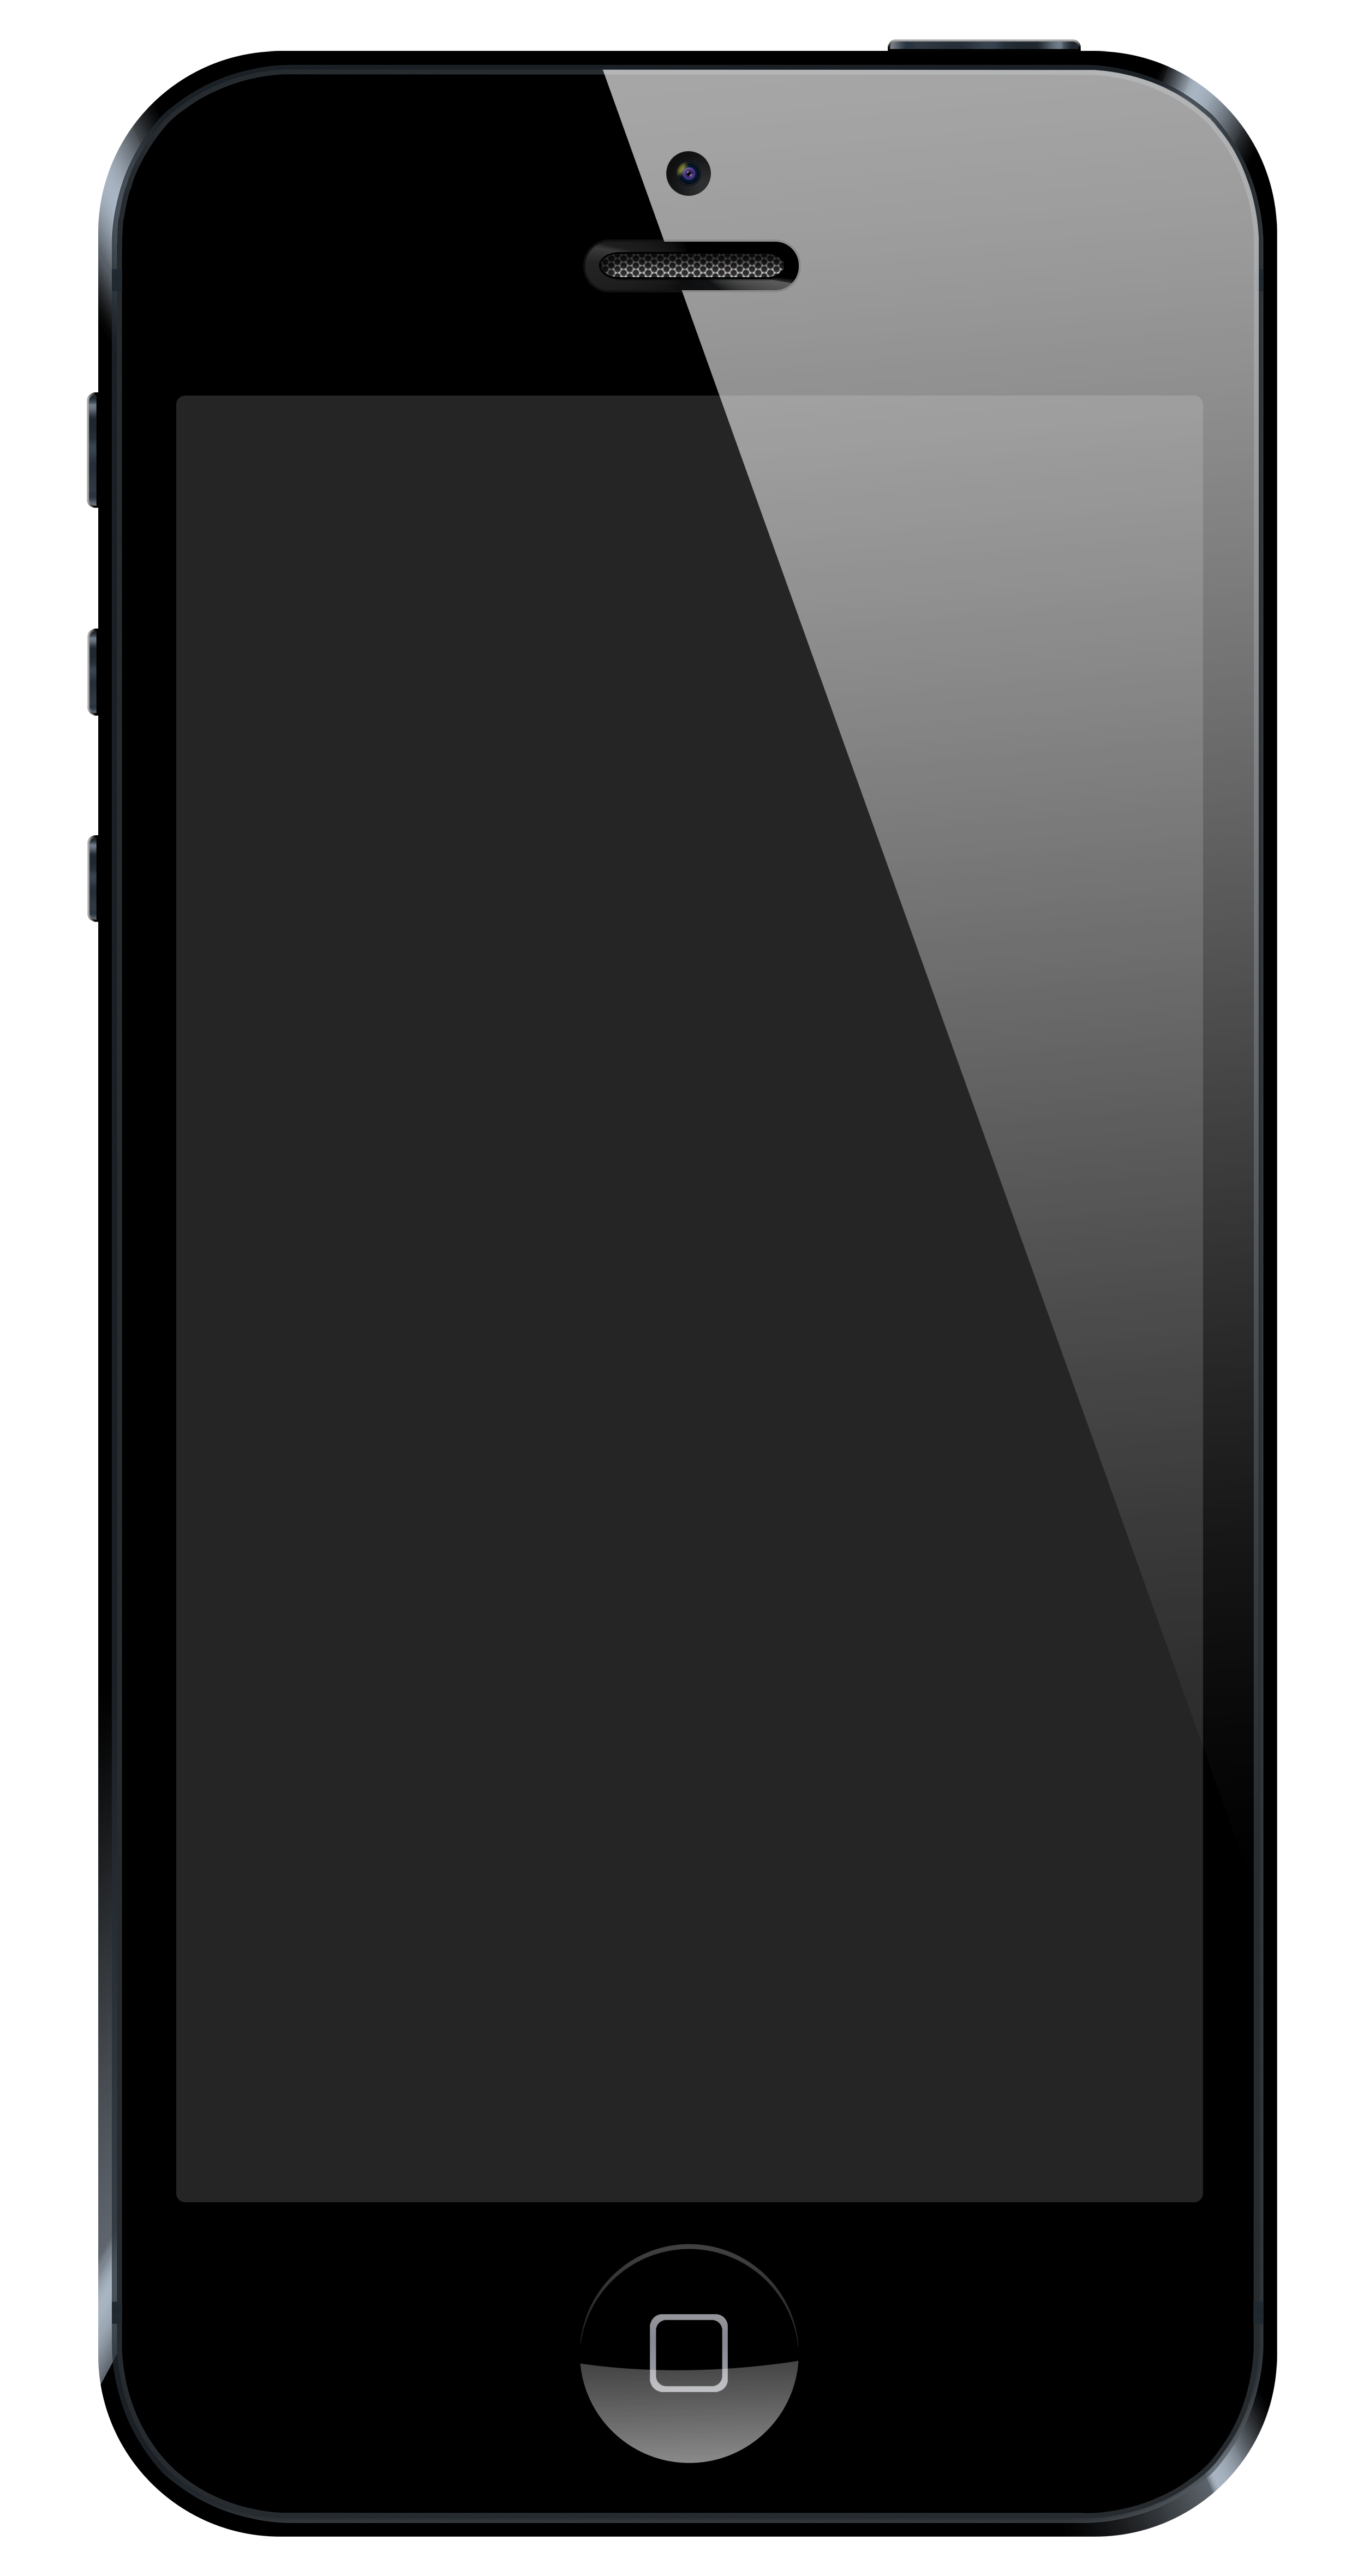 Original file PlusPng.com  - Iphone HD PNG